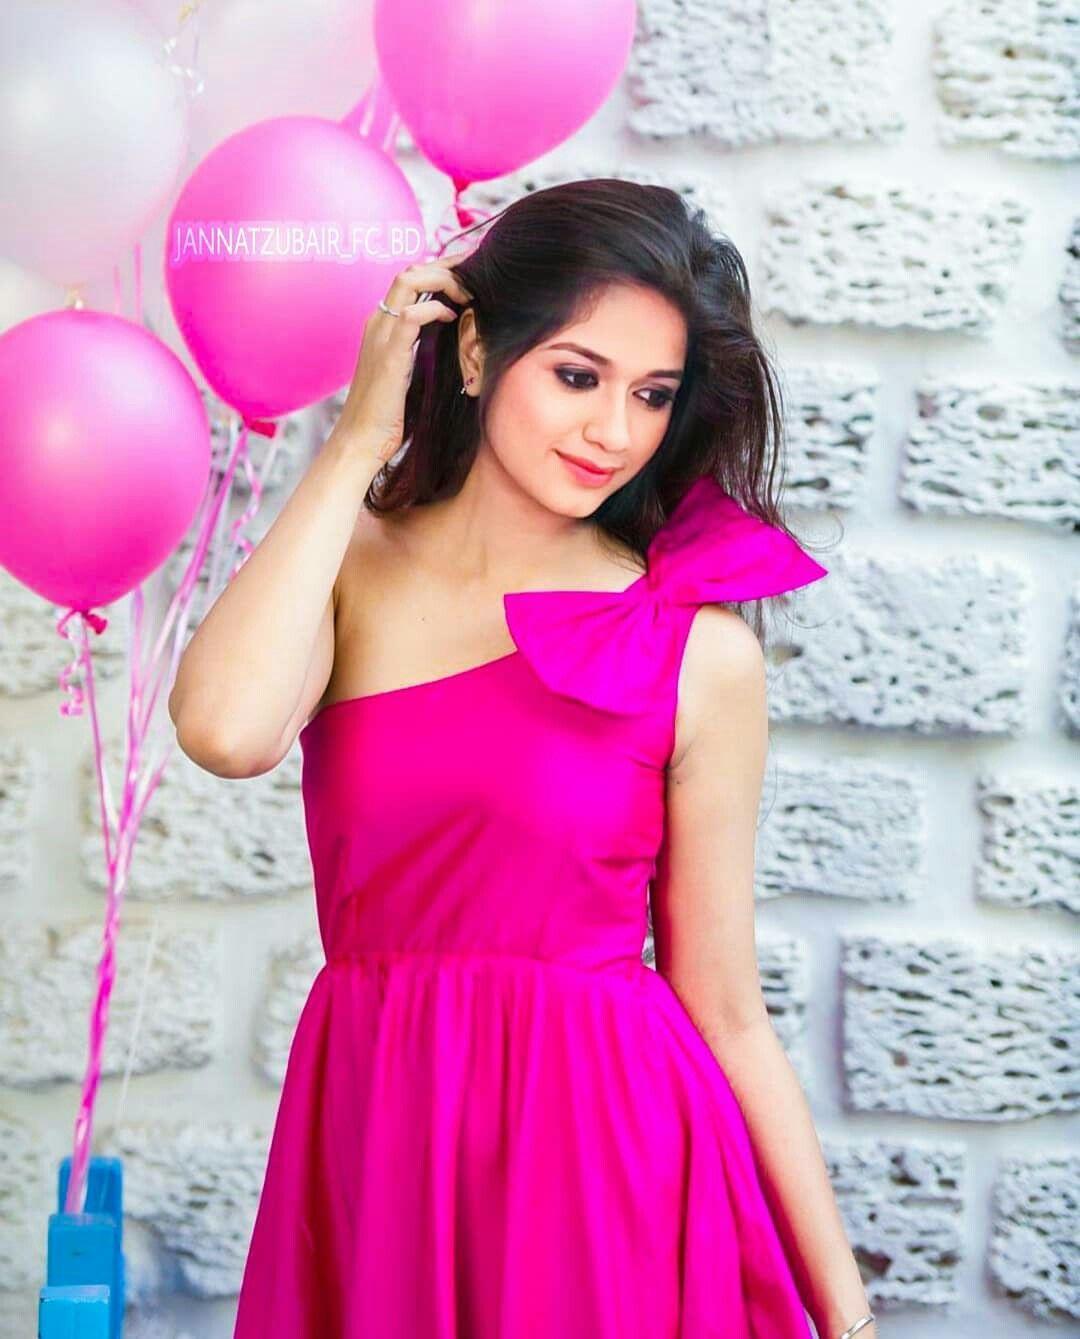 Jannat zubair pink dress  Pin by Mîsbàh Rãhmàñ on Jannat zubair rahmani  Pinterest  Teen